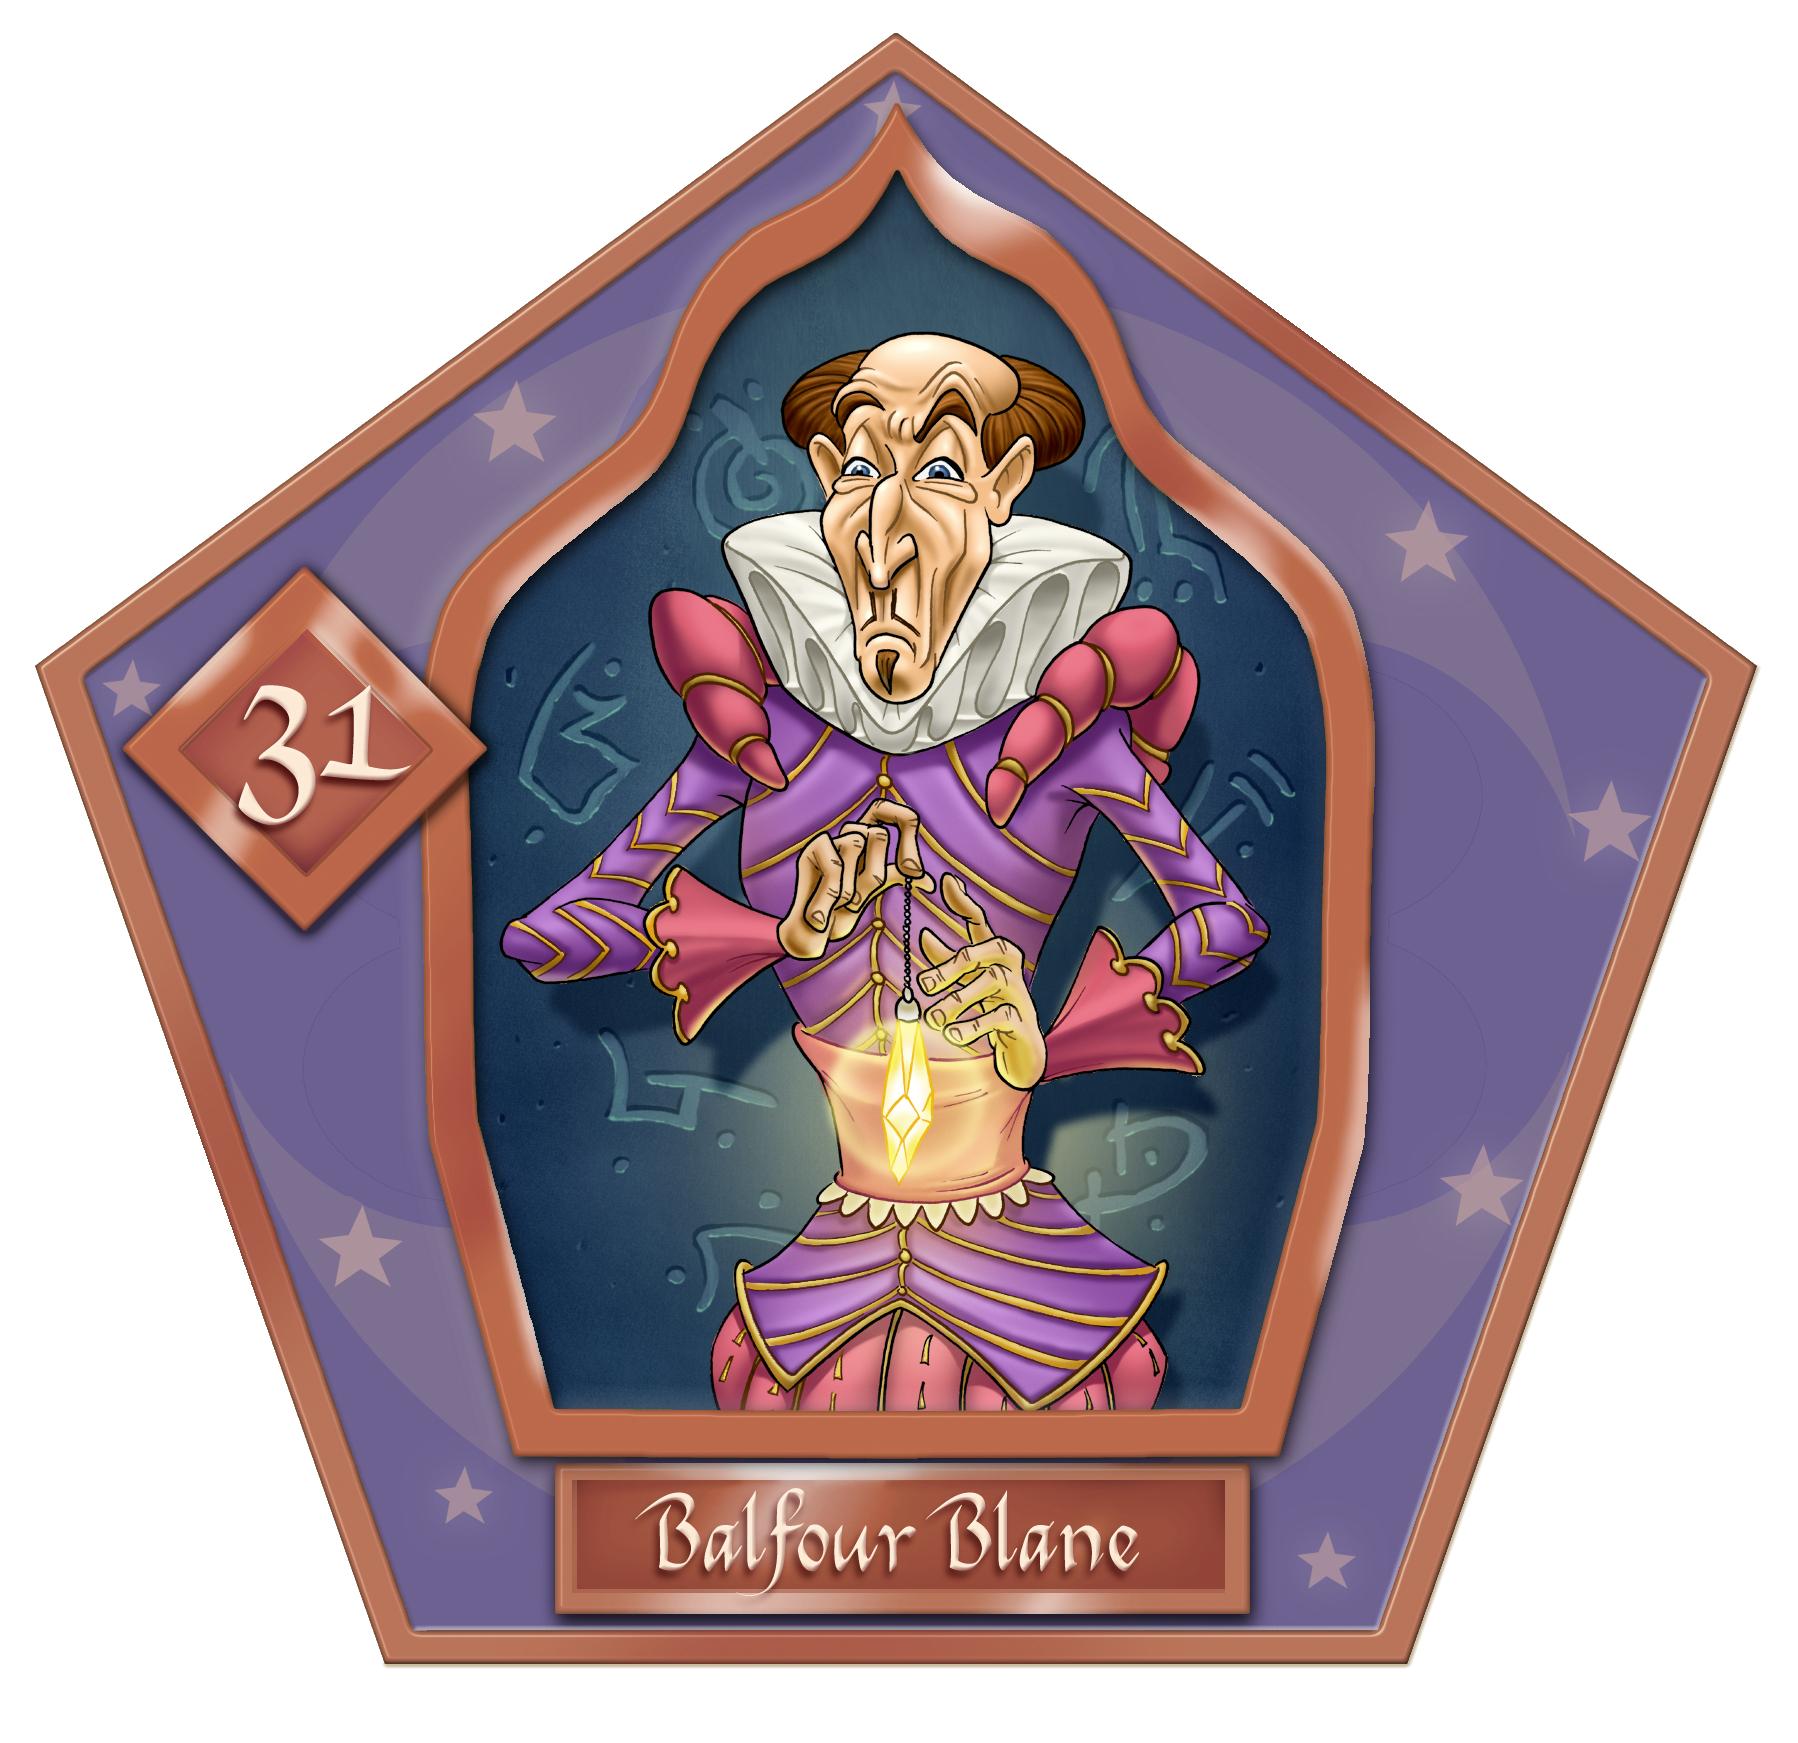 Balfour Blane-31-chocFrogCard